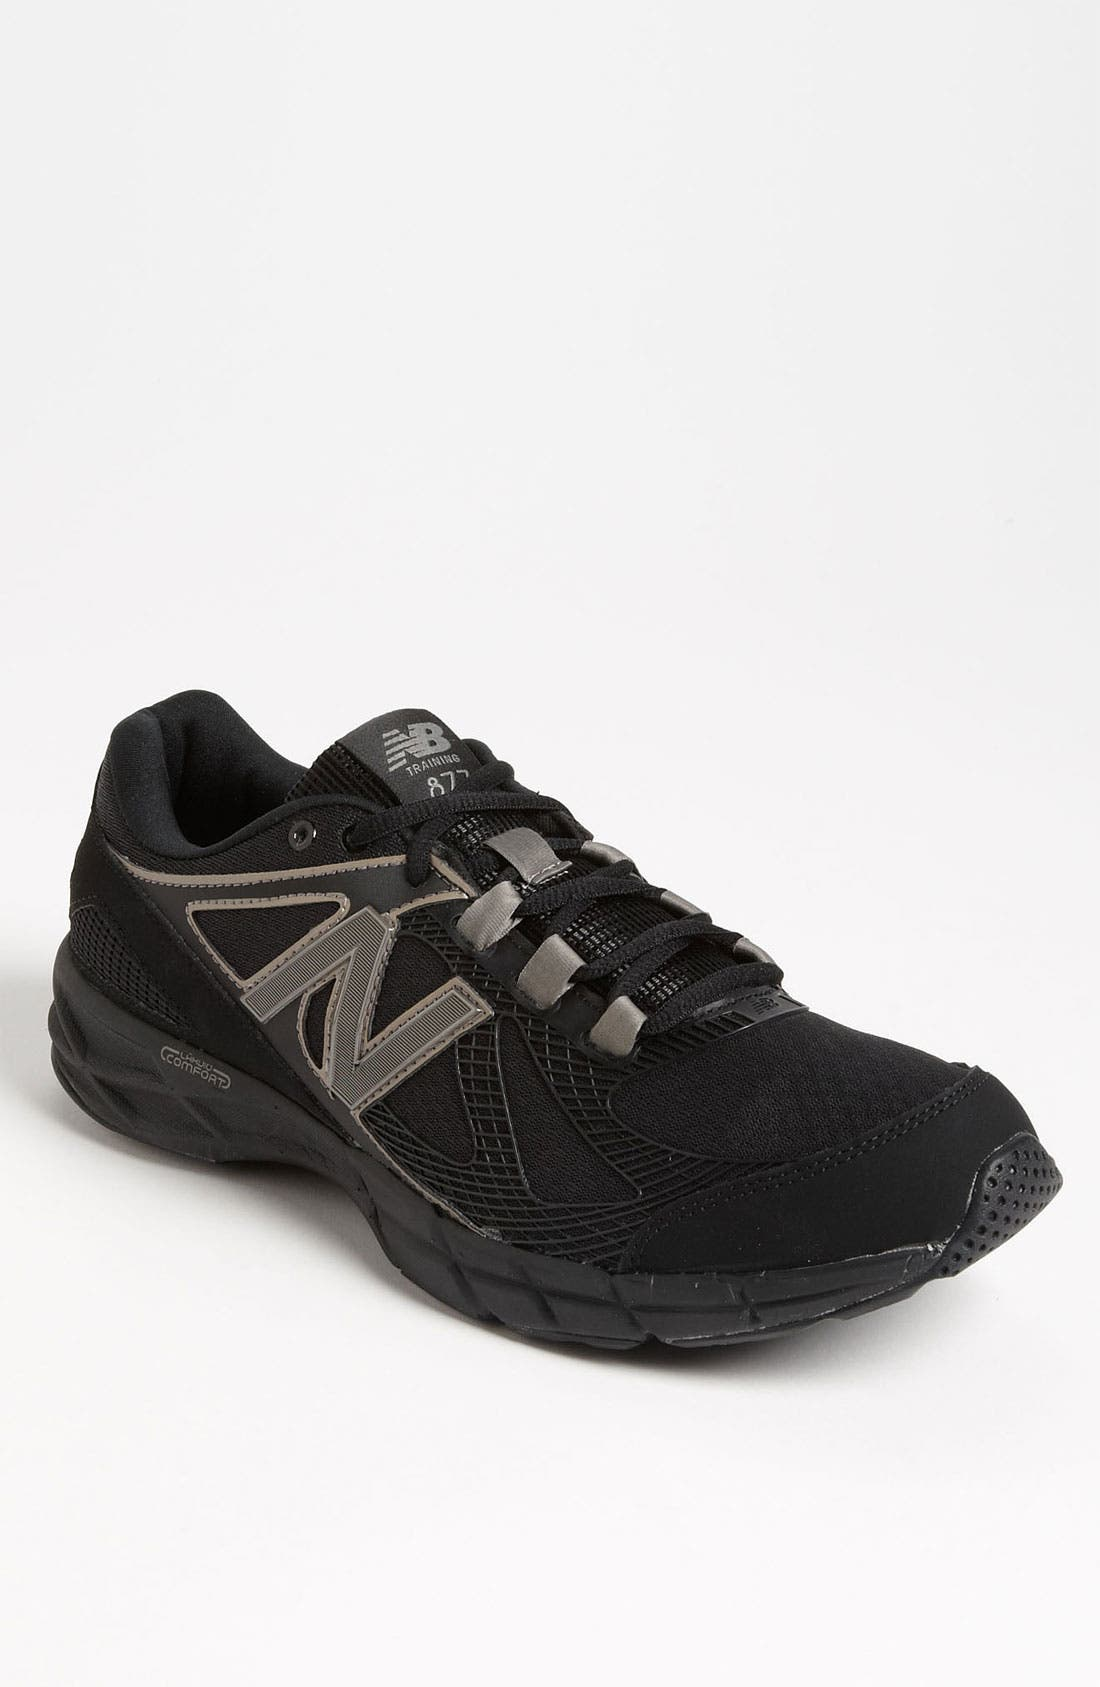 Main Image - New Balance '877' Training Shoe (Men) (Online Only)